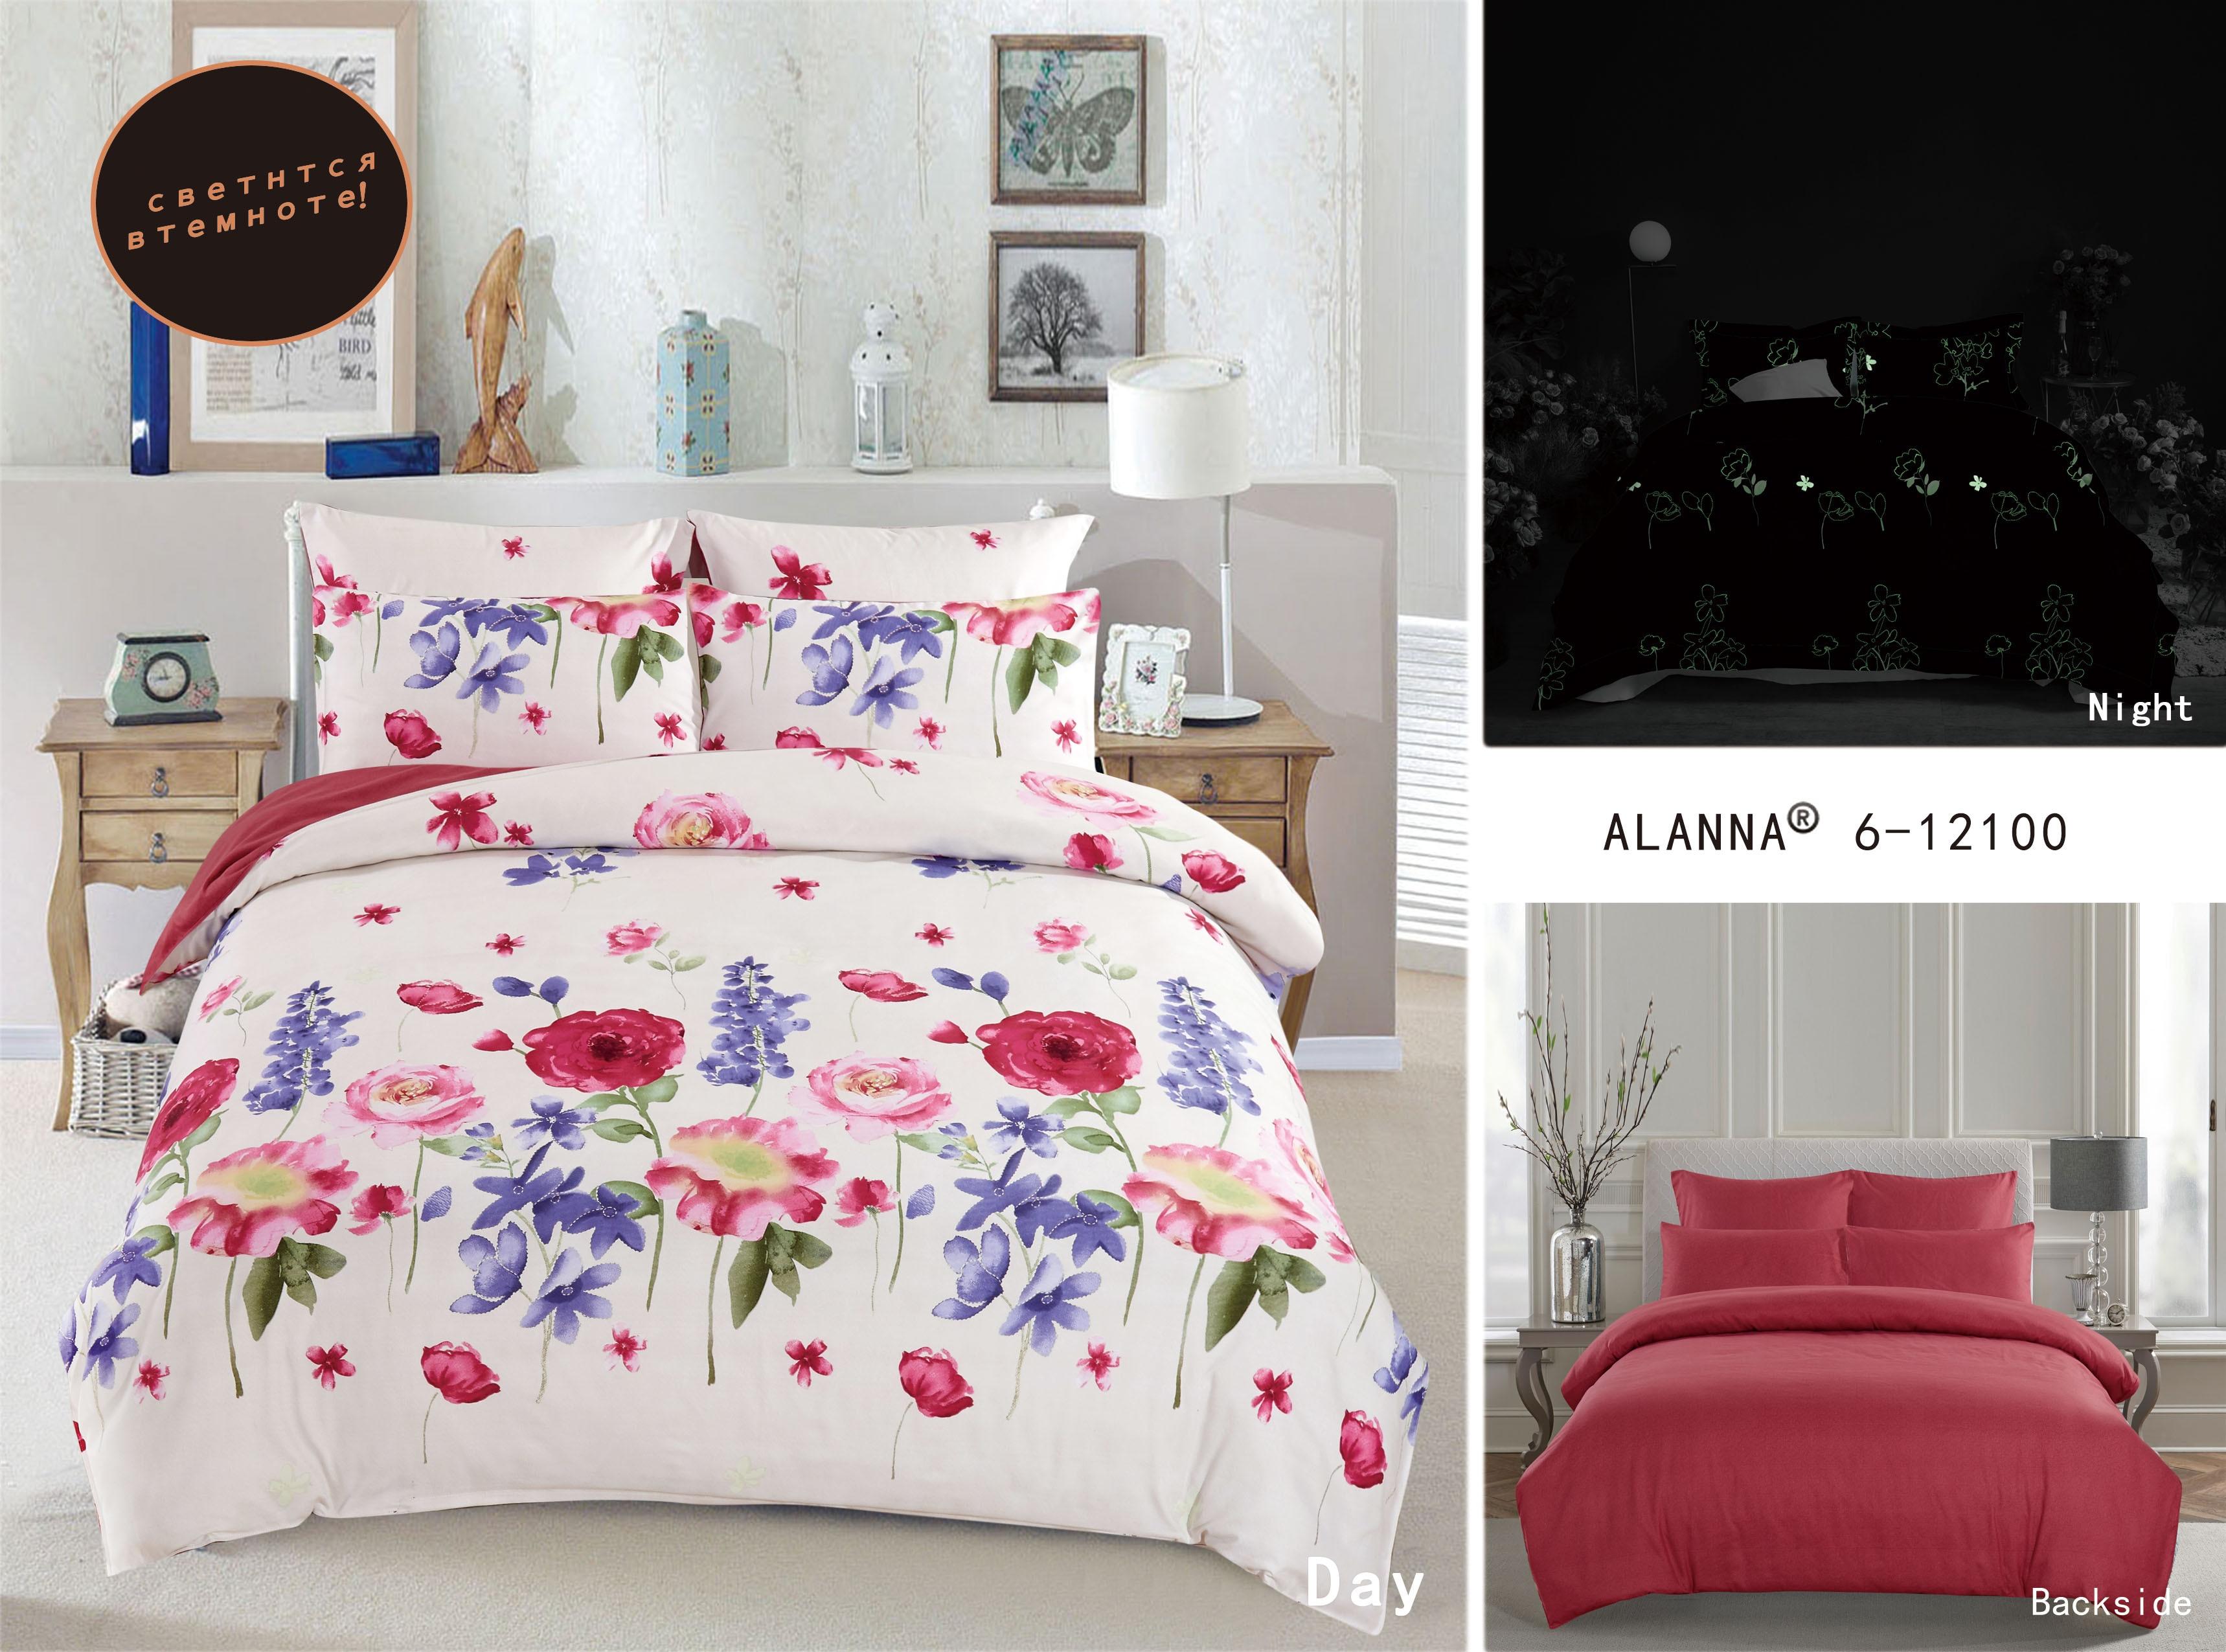 Alanna Flower Printed Bedding Set Luminous Comforter Euro Pastel  Bed Sheet King Size Double Bedspread Bedding Cover Set